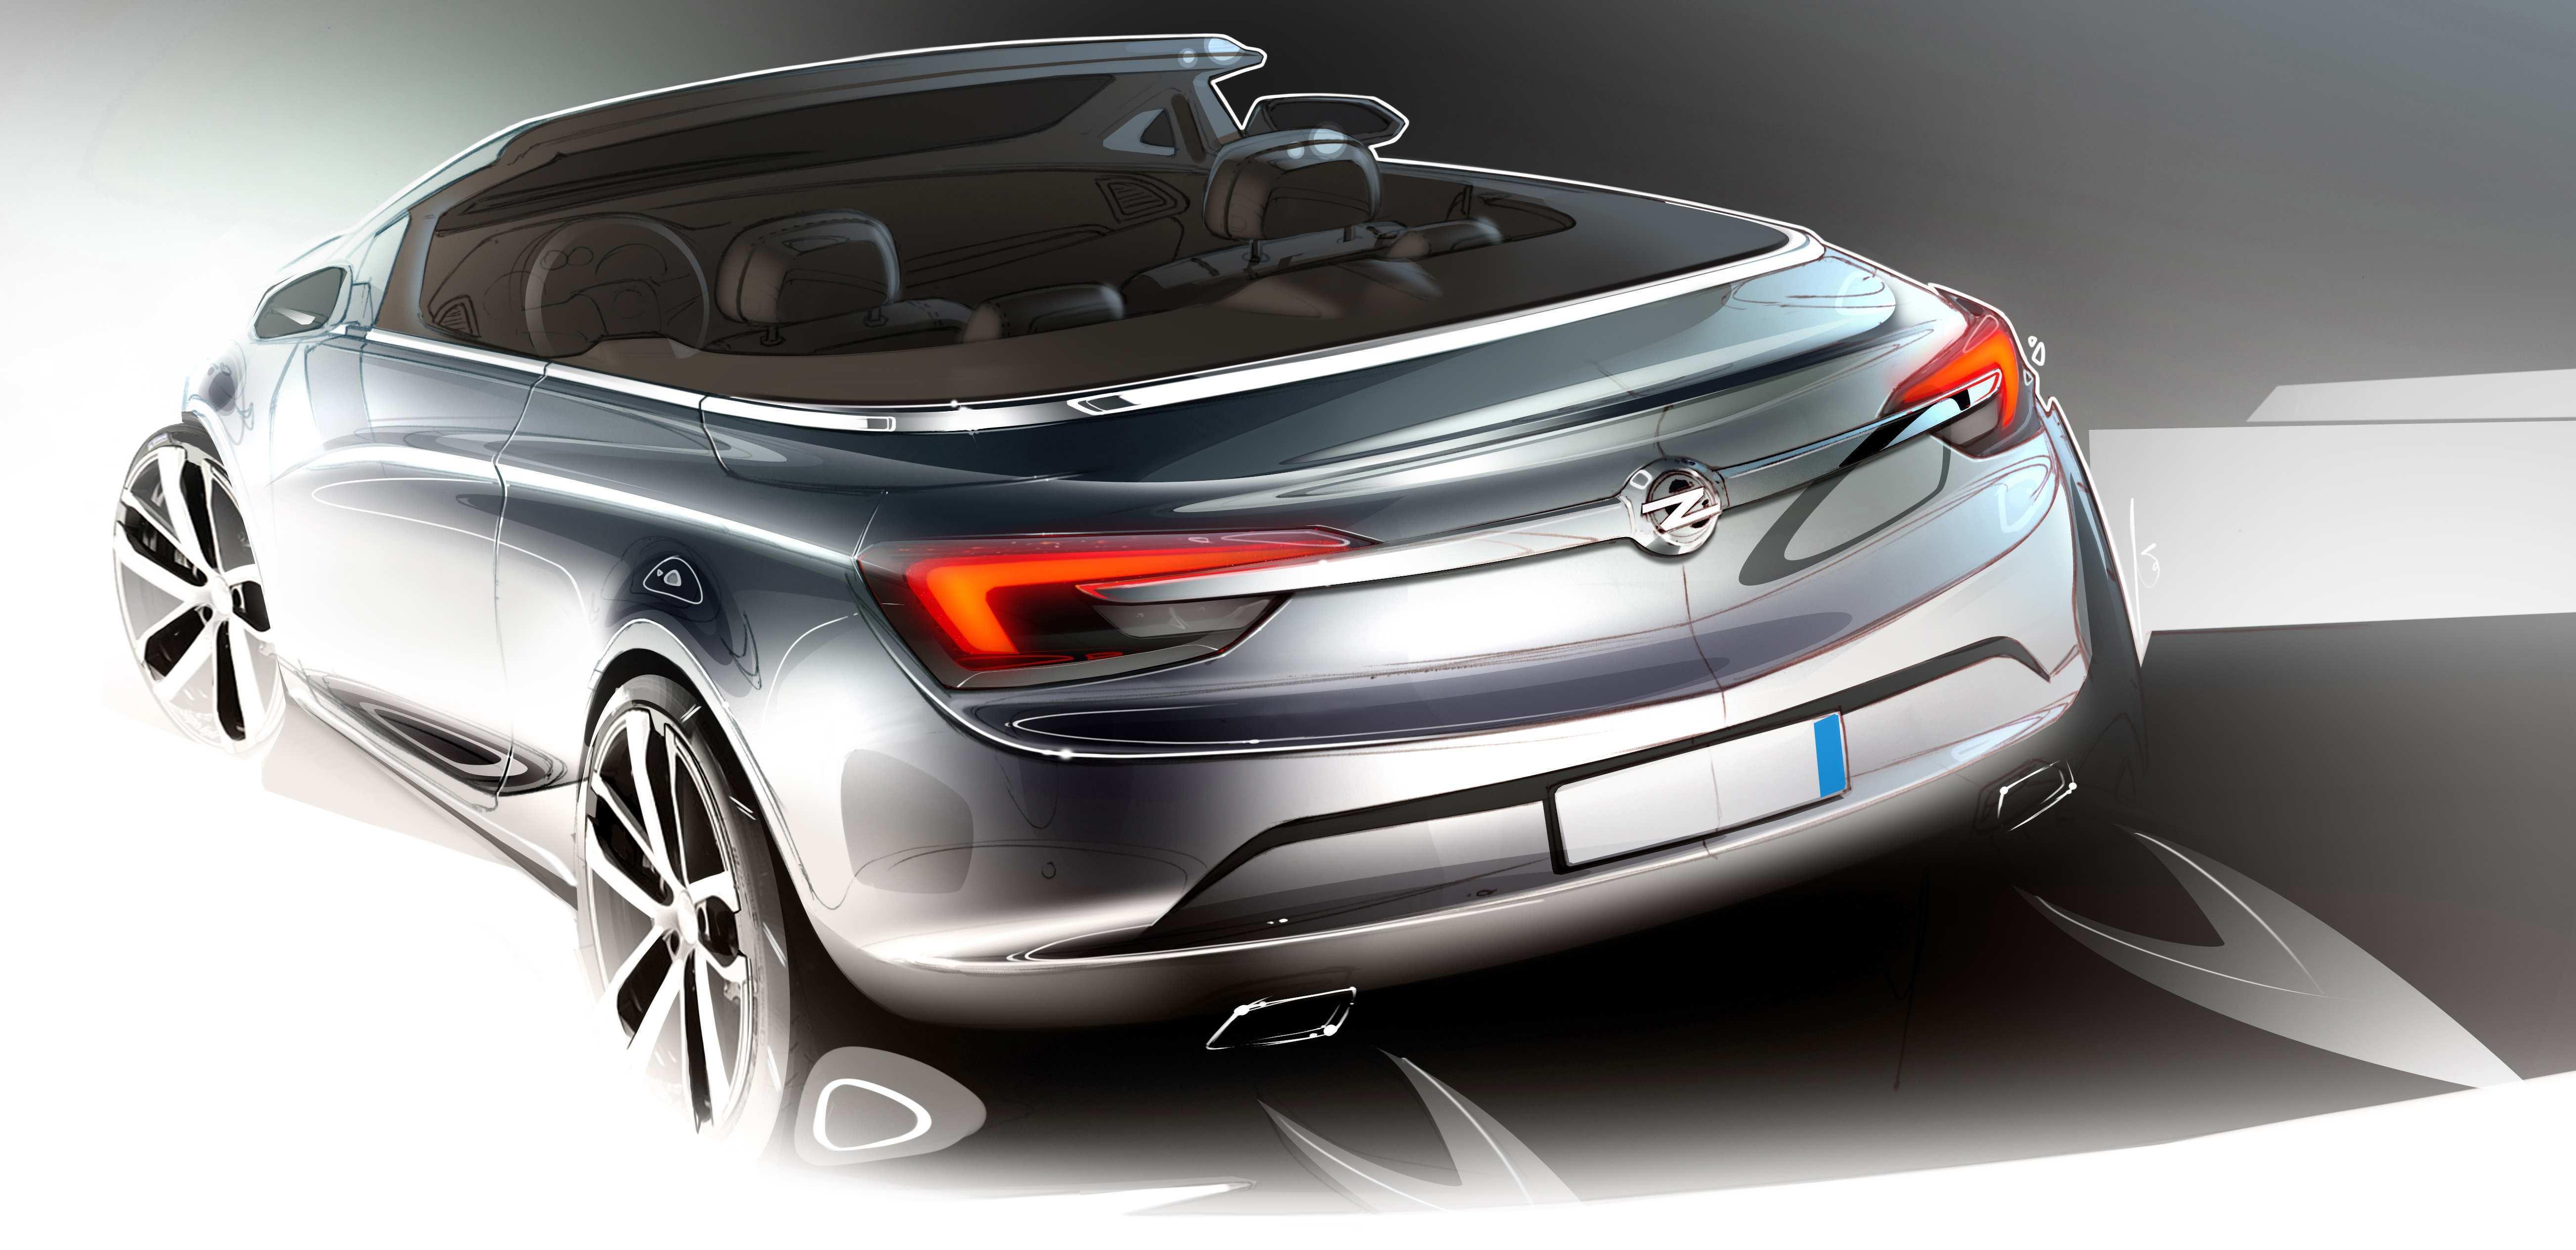 92 Concept of Opel Cascada 2020 History by Opel Cascada 2020